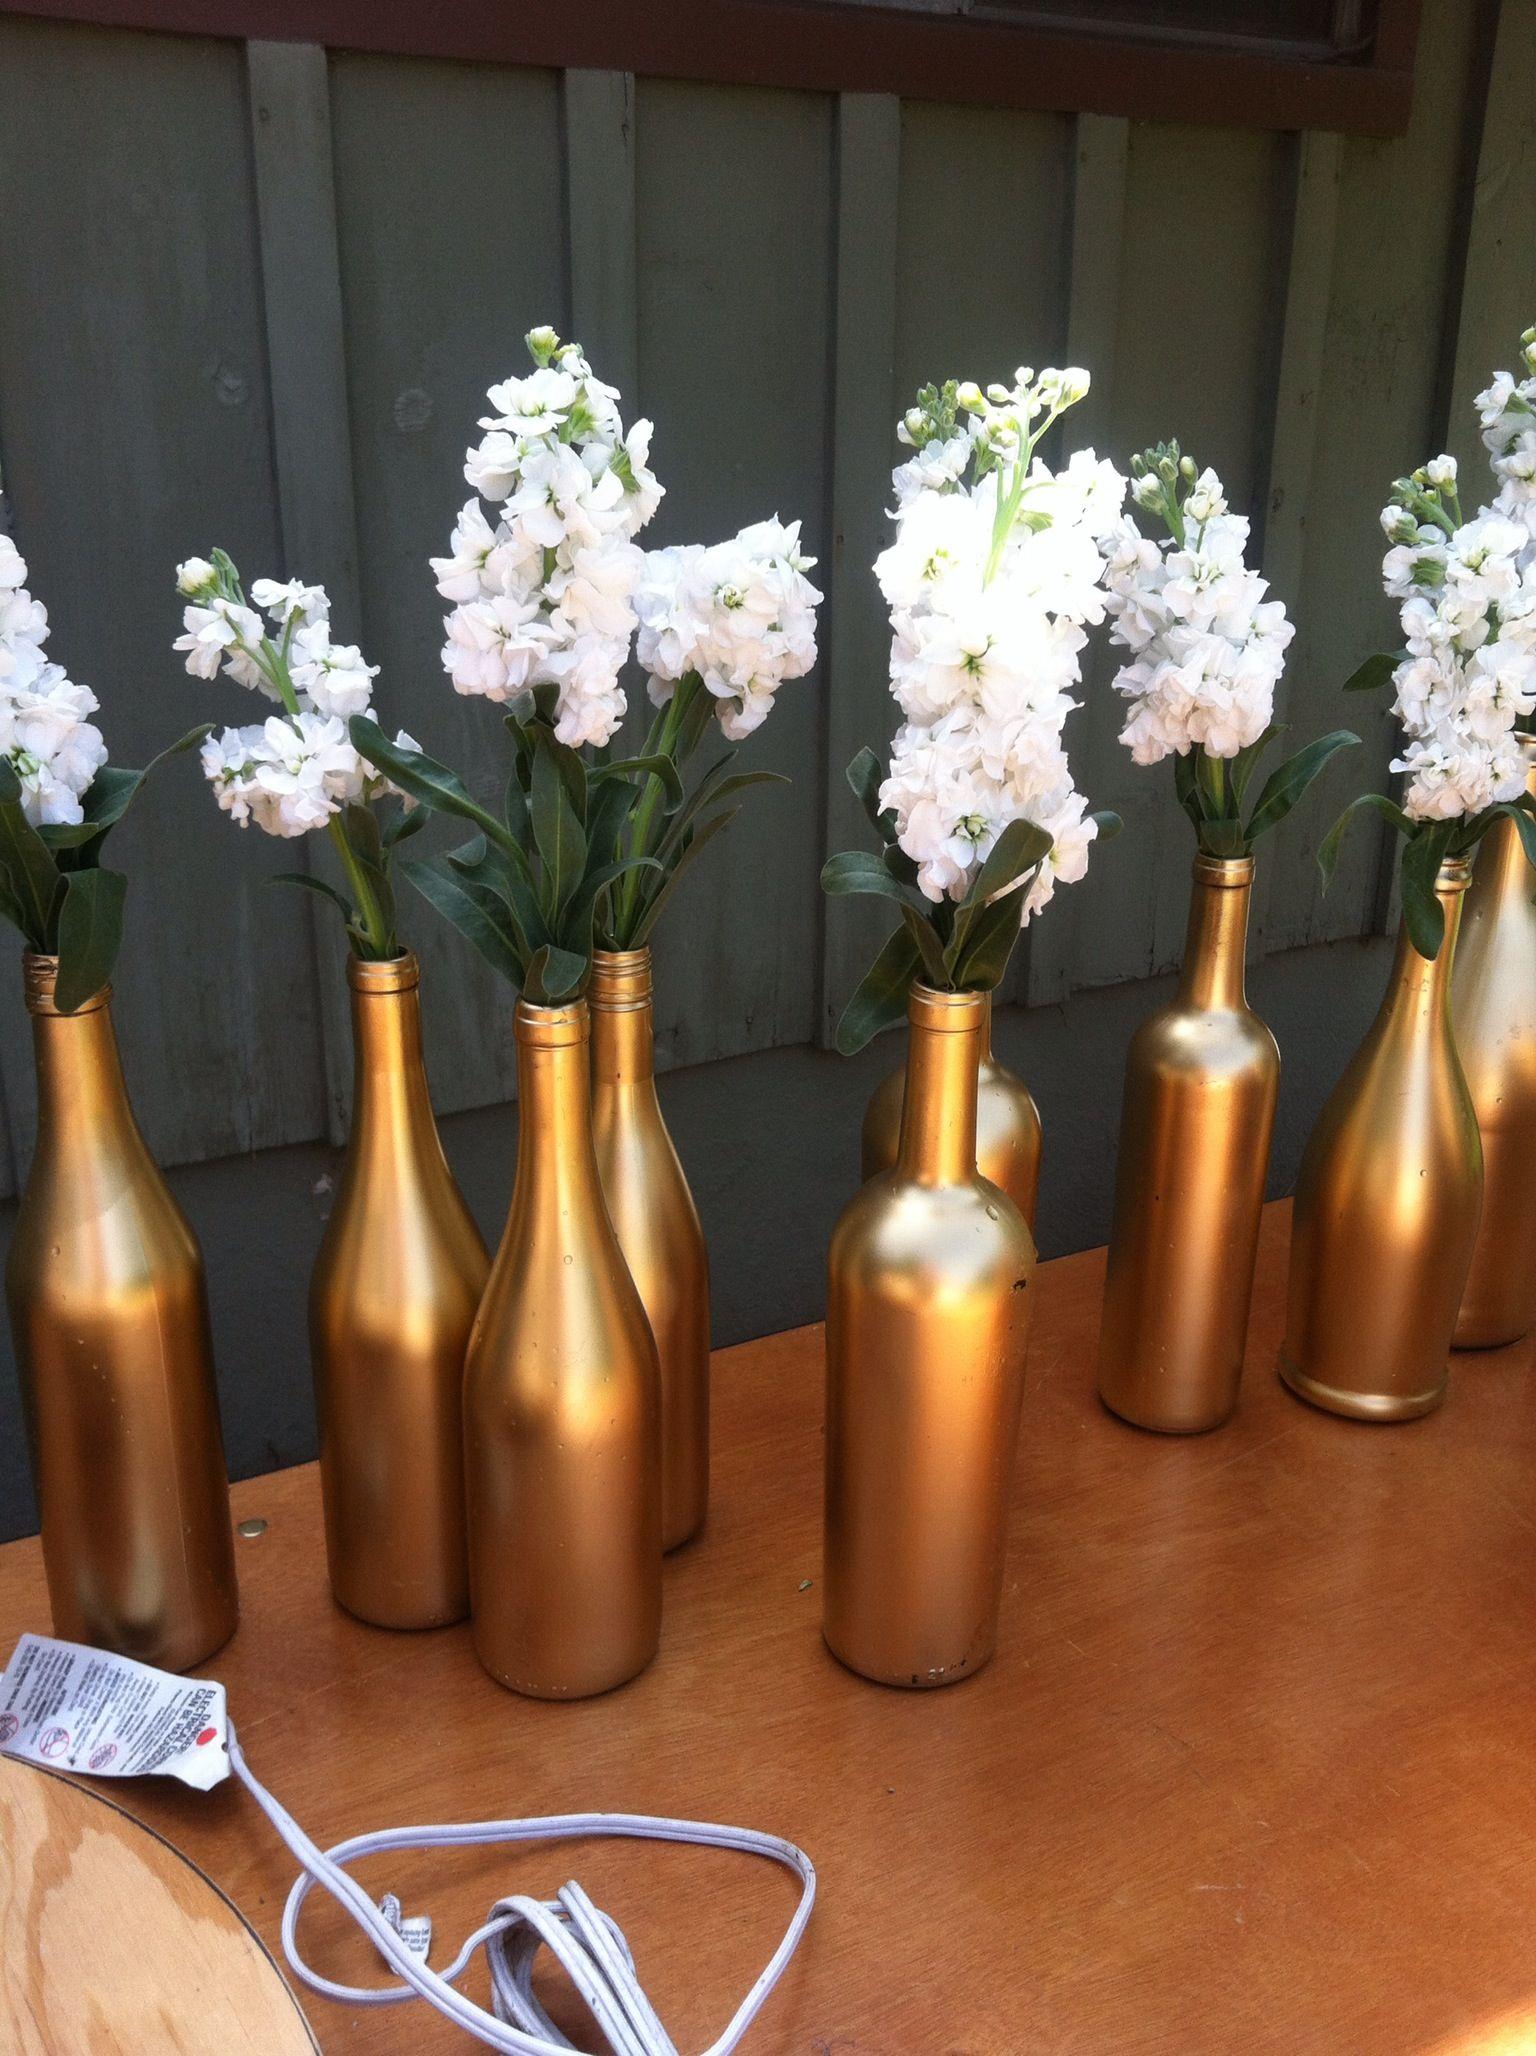 Metallic Gold Spray Painted WineBottles W White Flowers Rustic Weddings